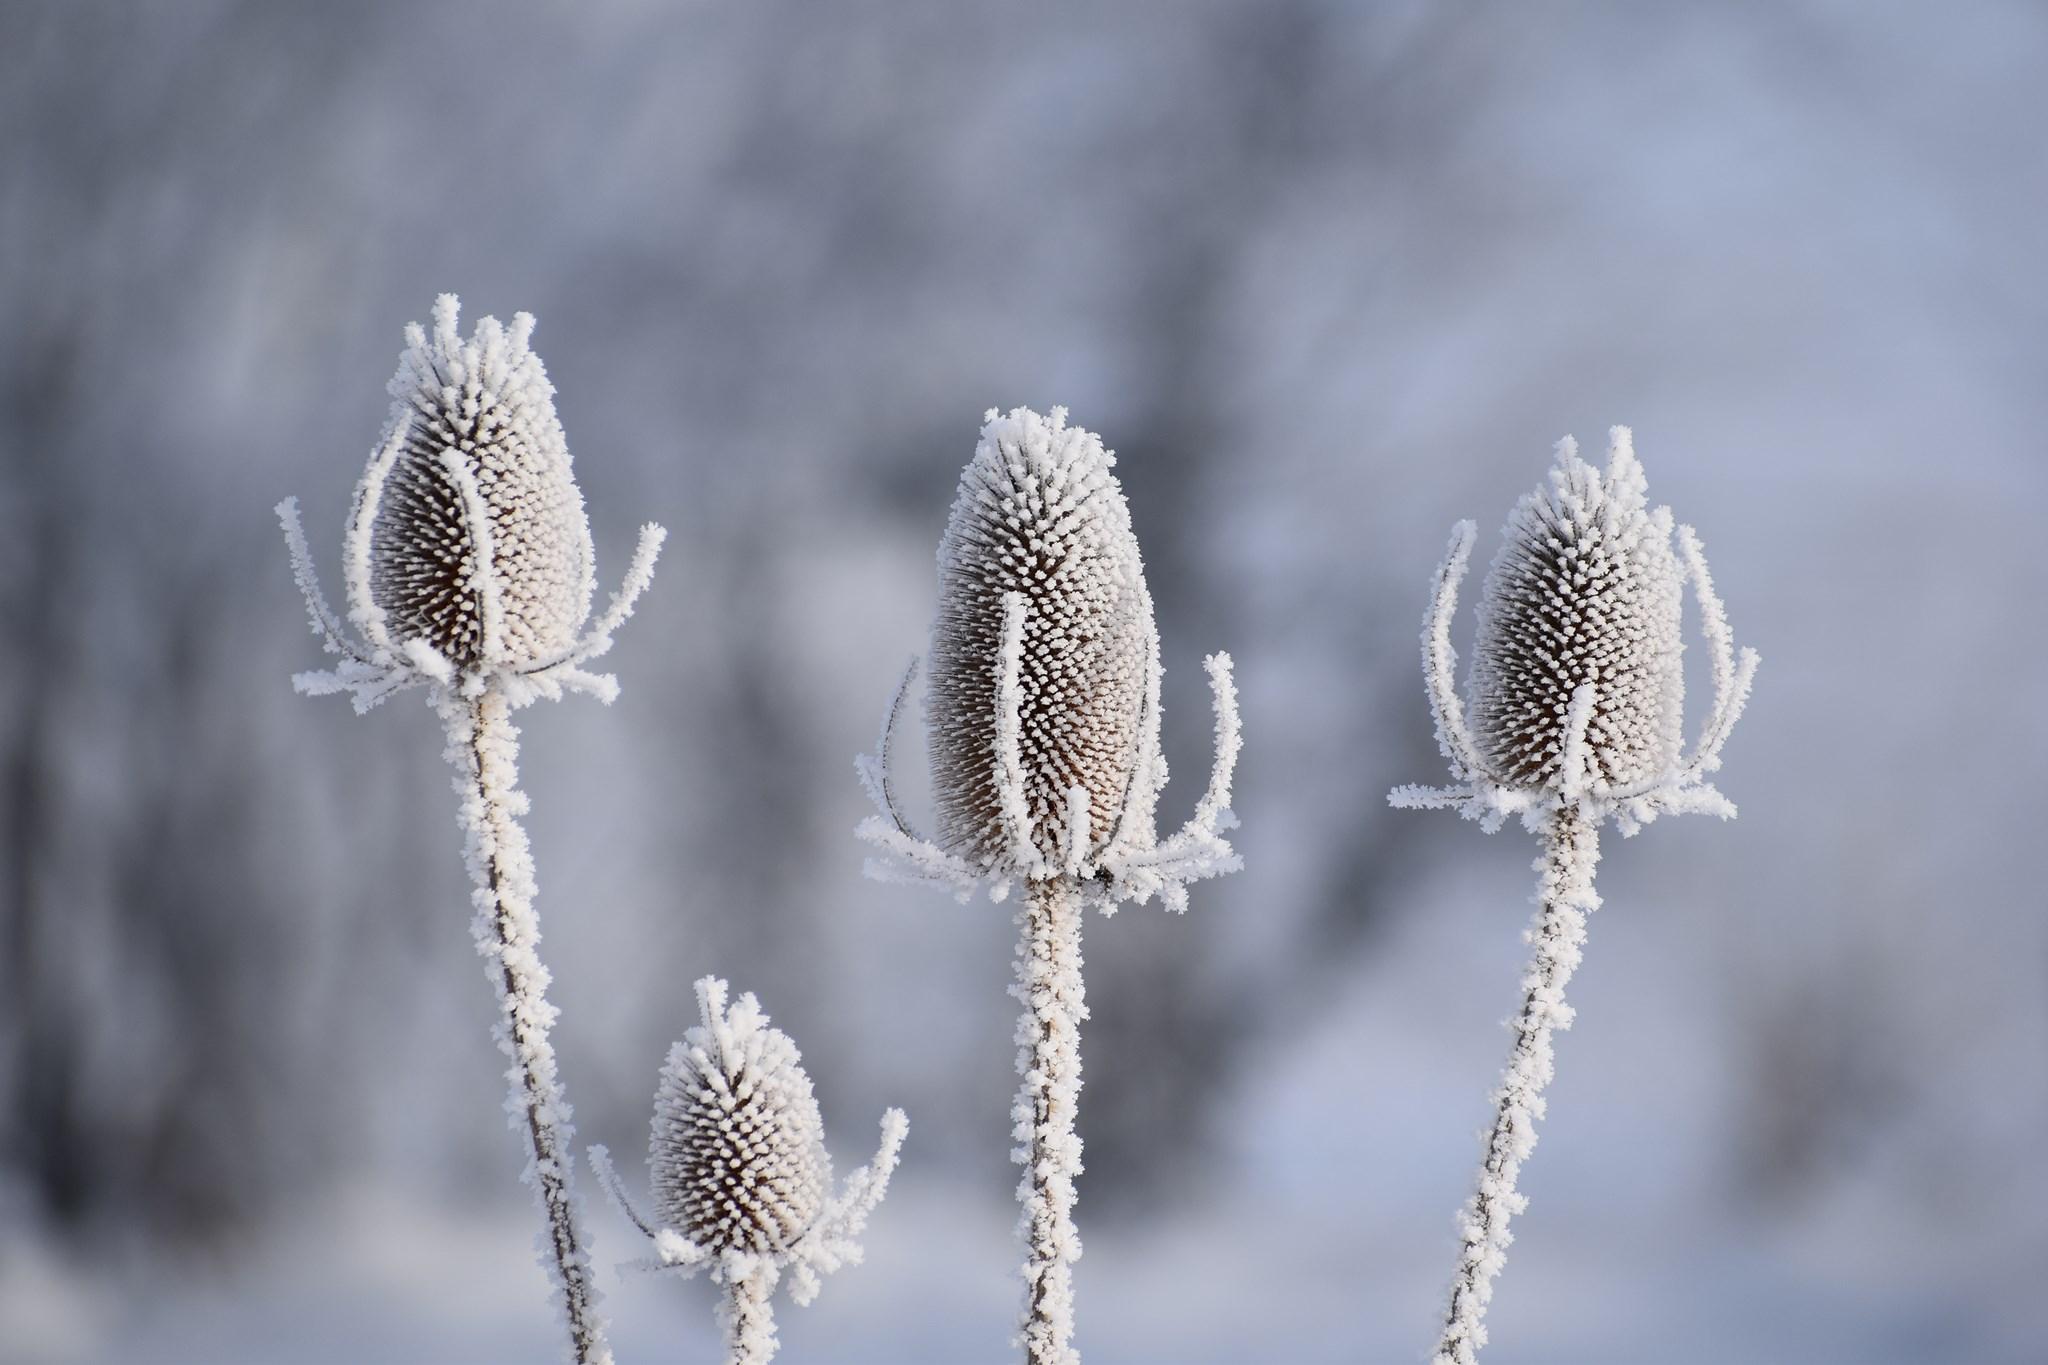 Winter is coming - Wilde Karde mit Frost